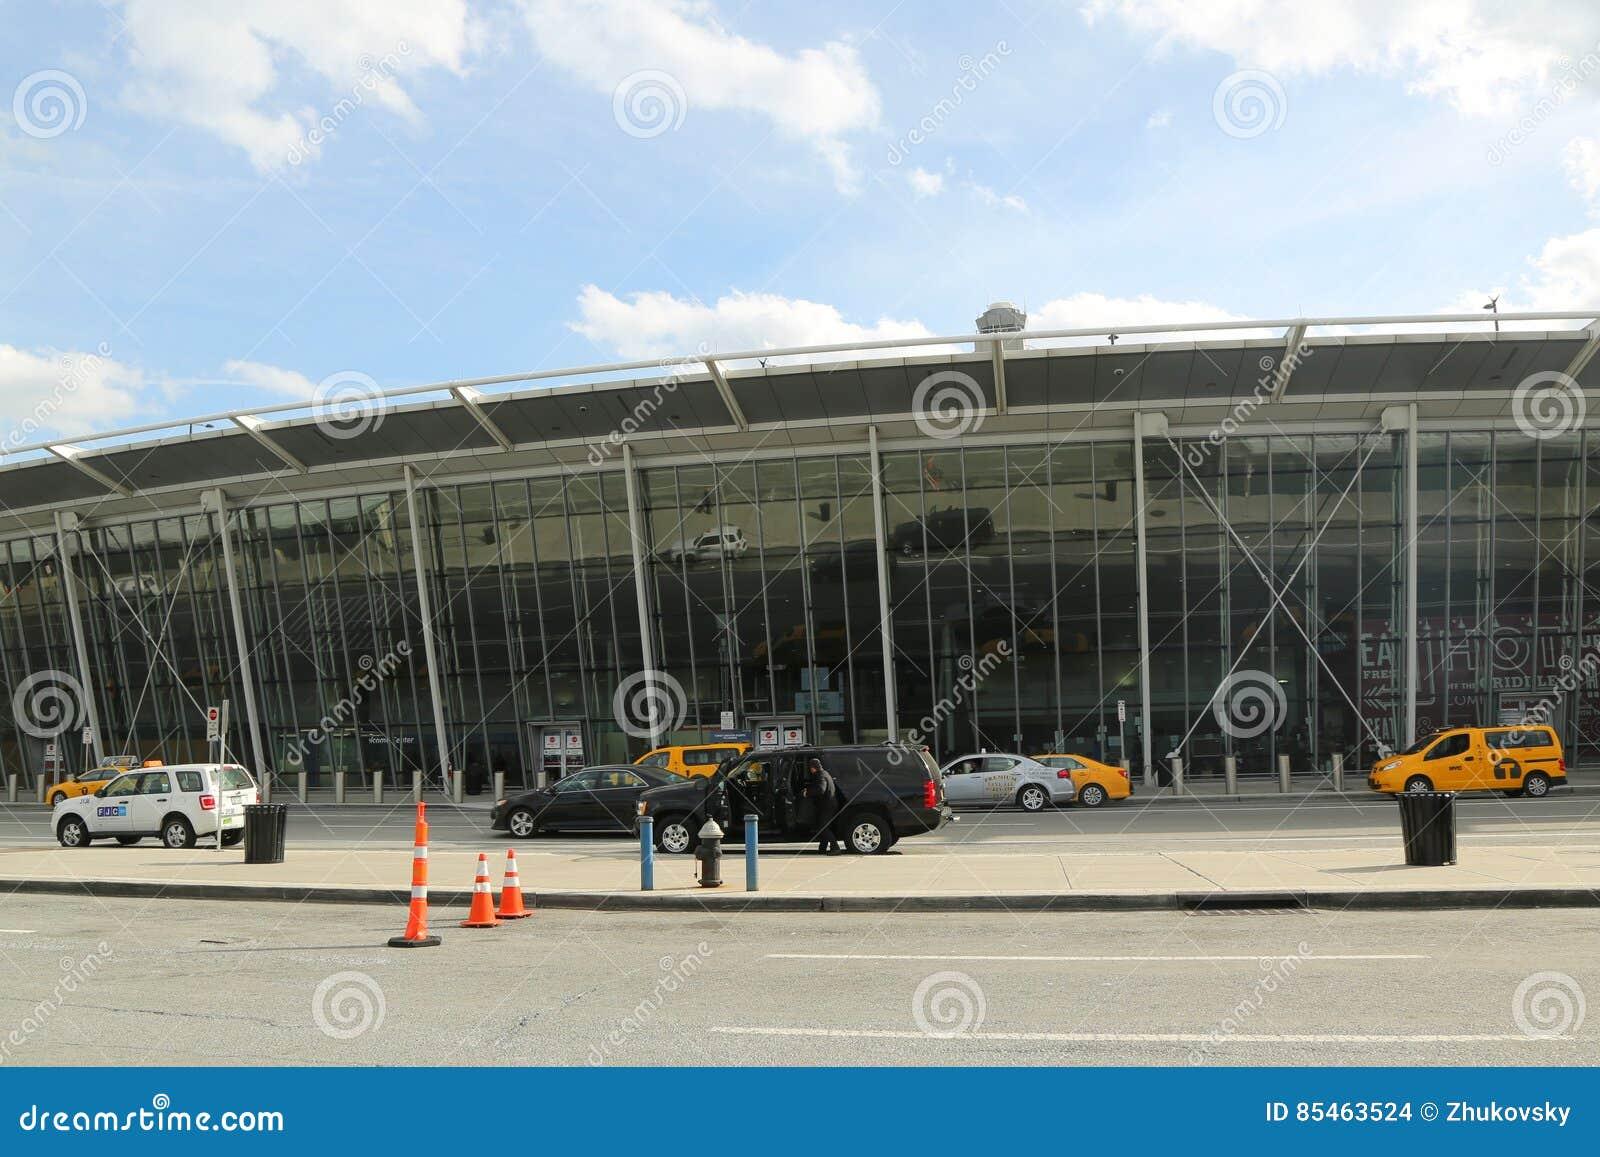 Aeroporto York : Terminal 4 da linha aérea do delta no aeroporto internacional de jfk